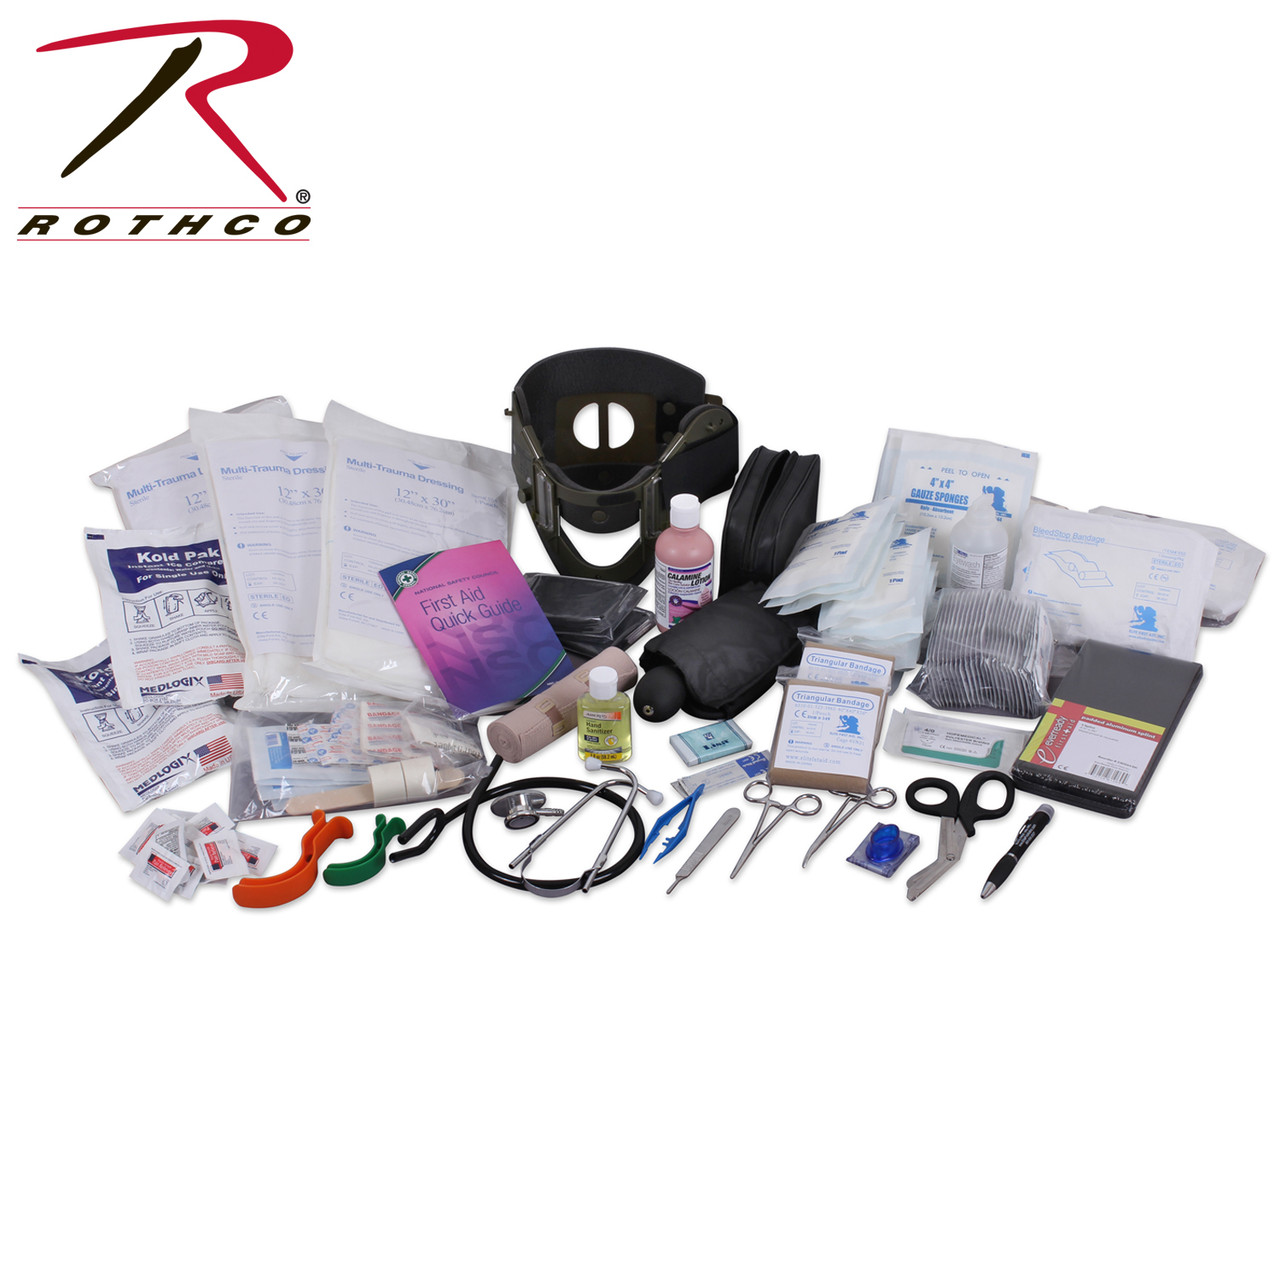 Rothco EMT Medical Trauma Kit  | Rothco 1145 | EMT 200 piece First Aid Kit